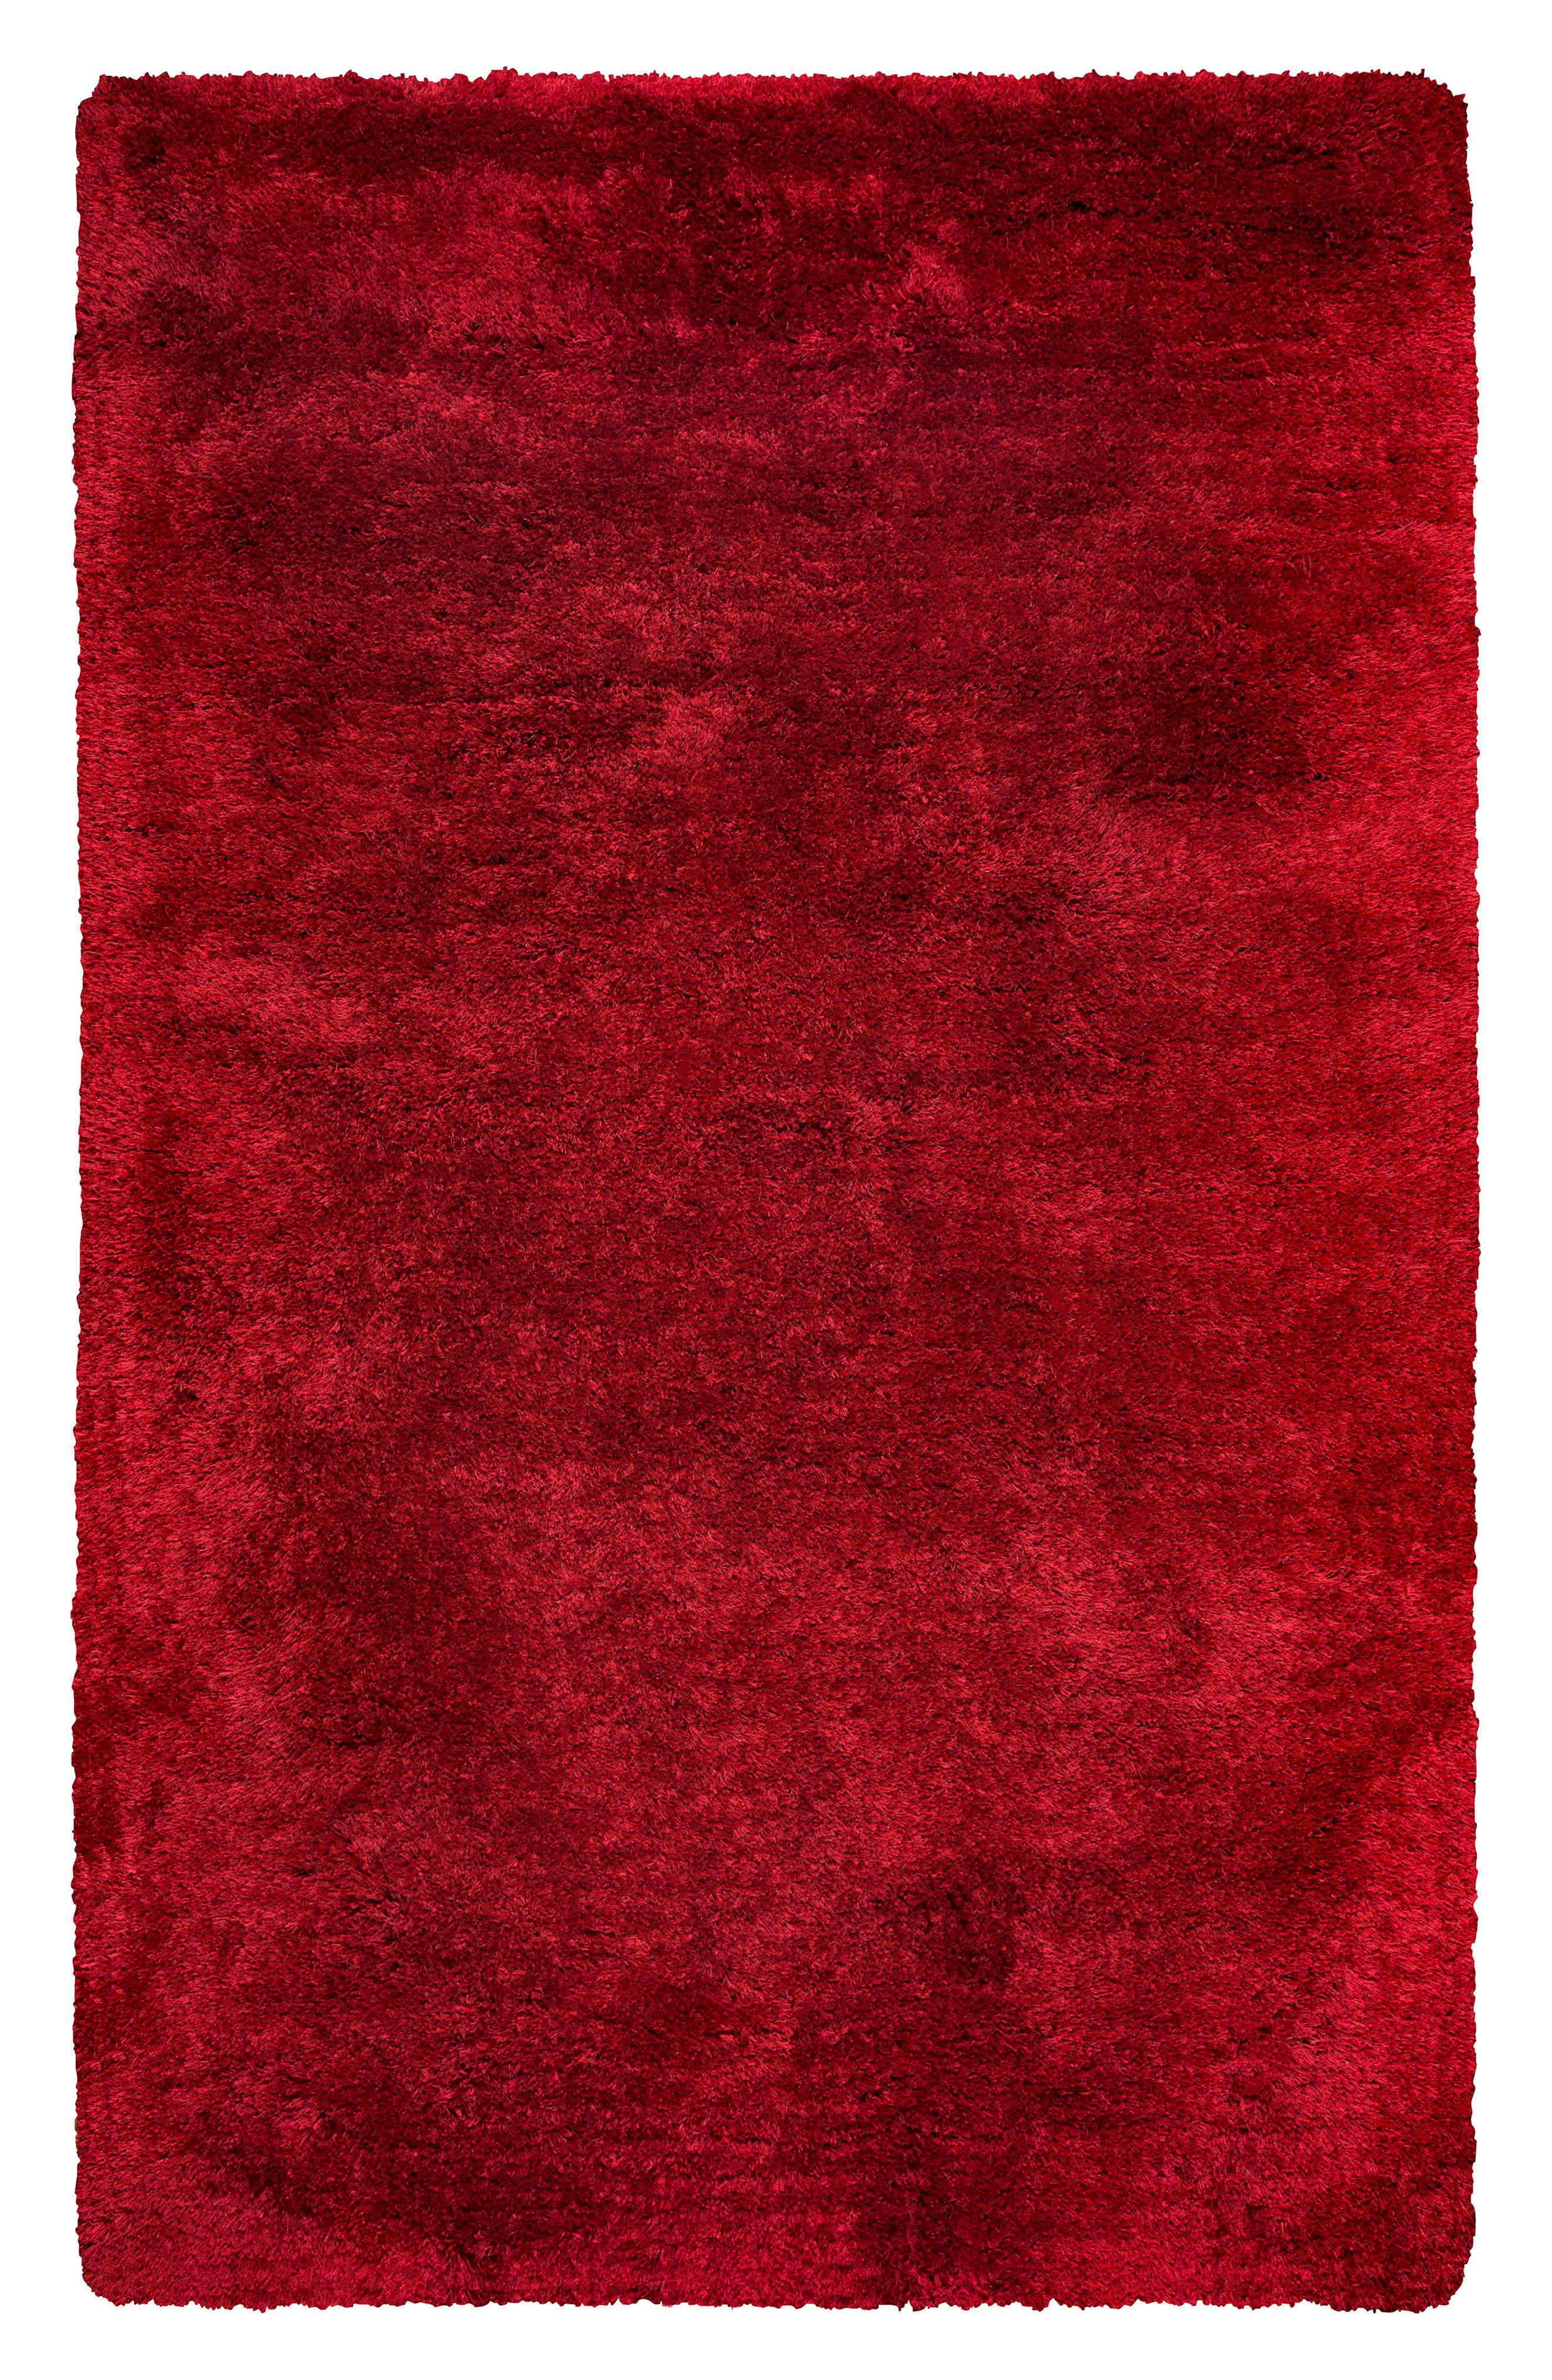 Plush Shag Hand Tufted Area Rug,                         Main,                         color, Red